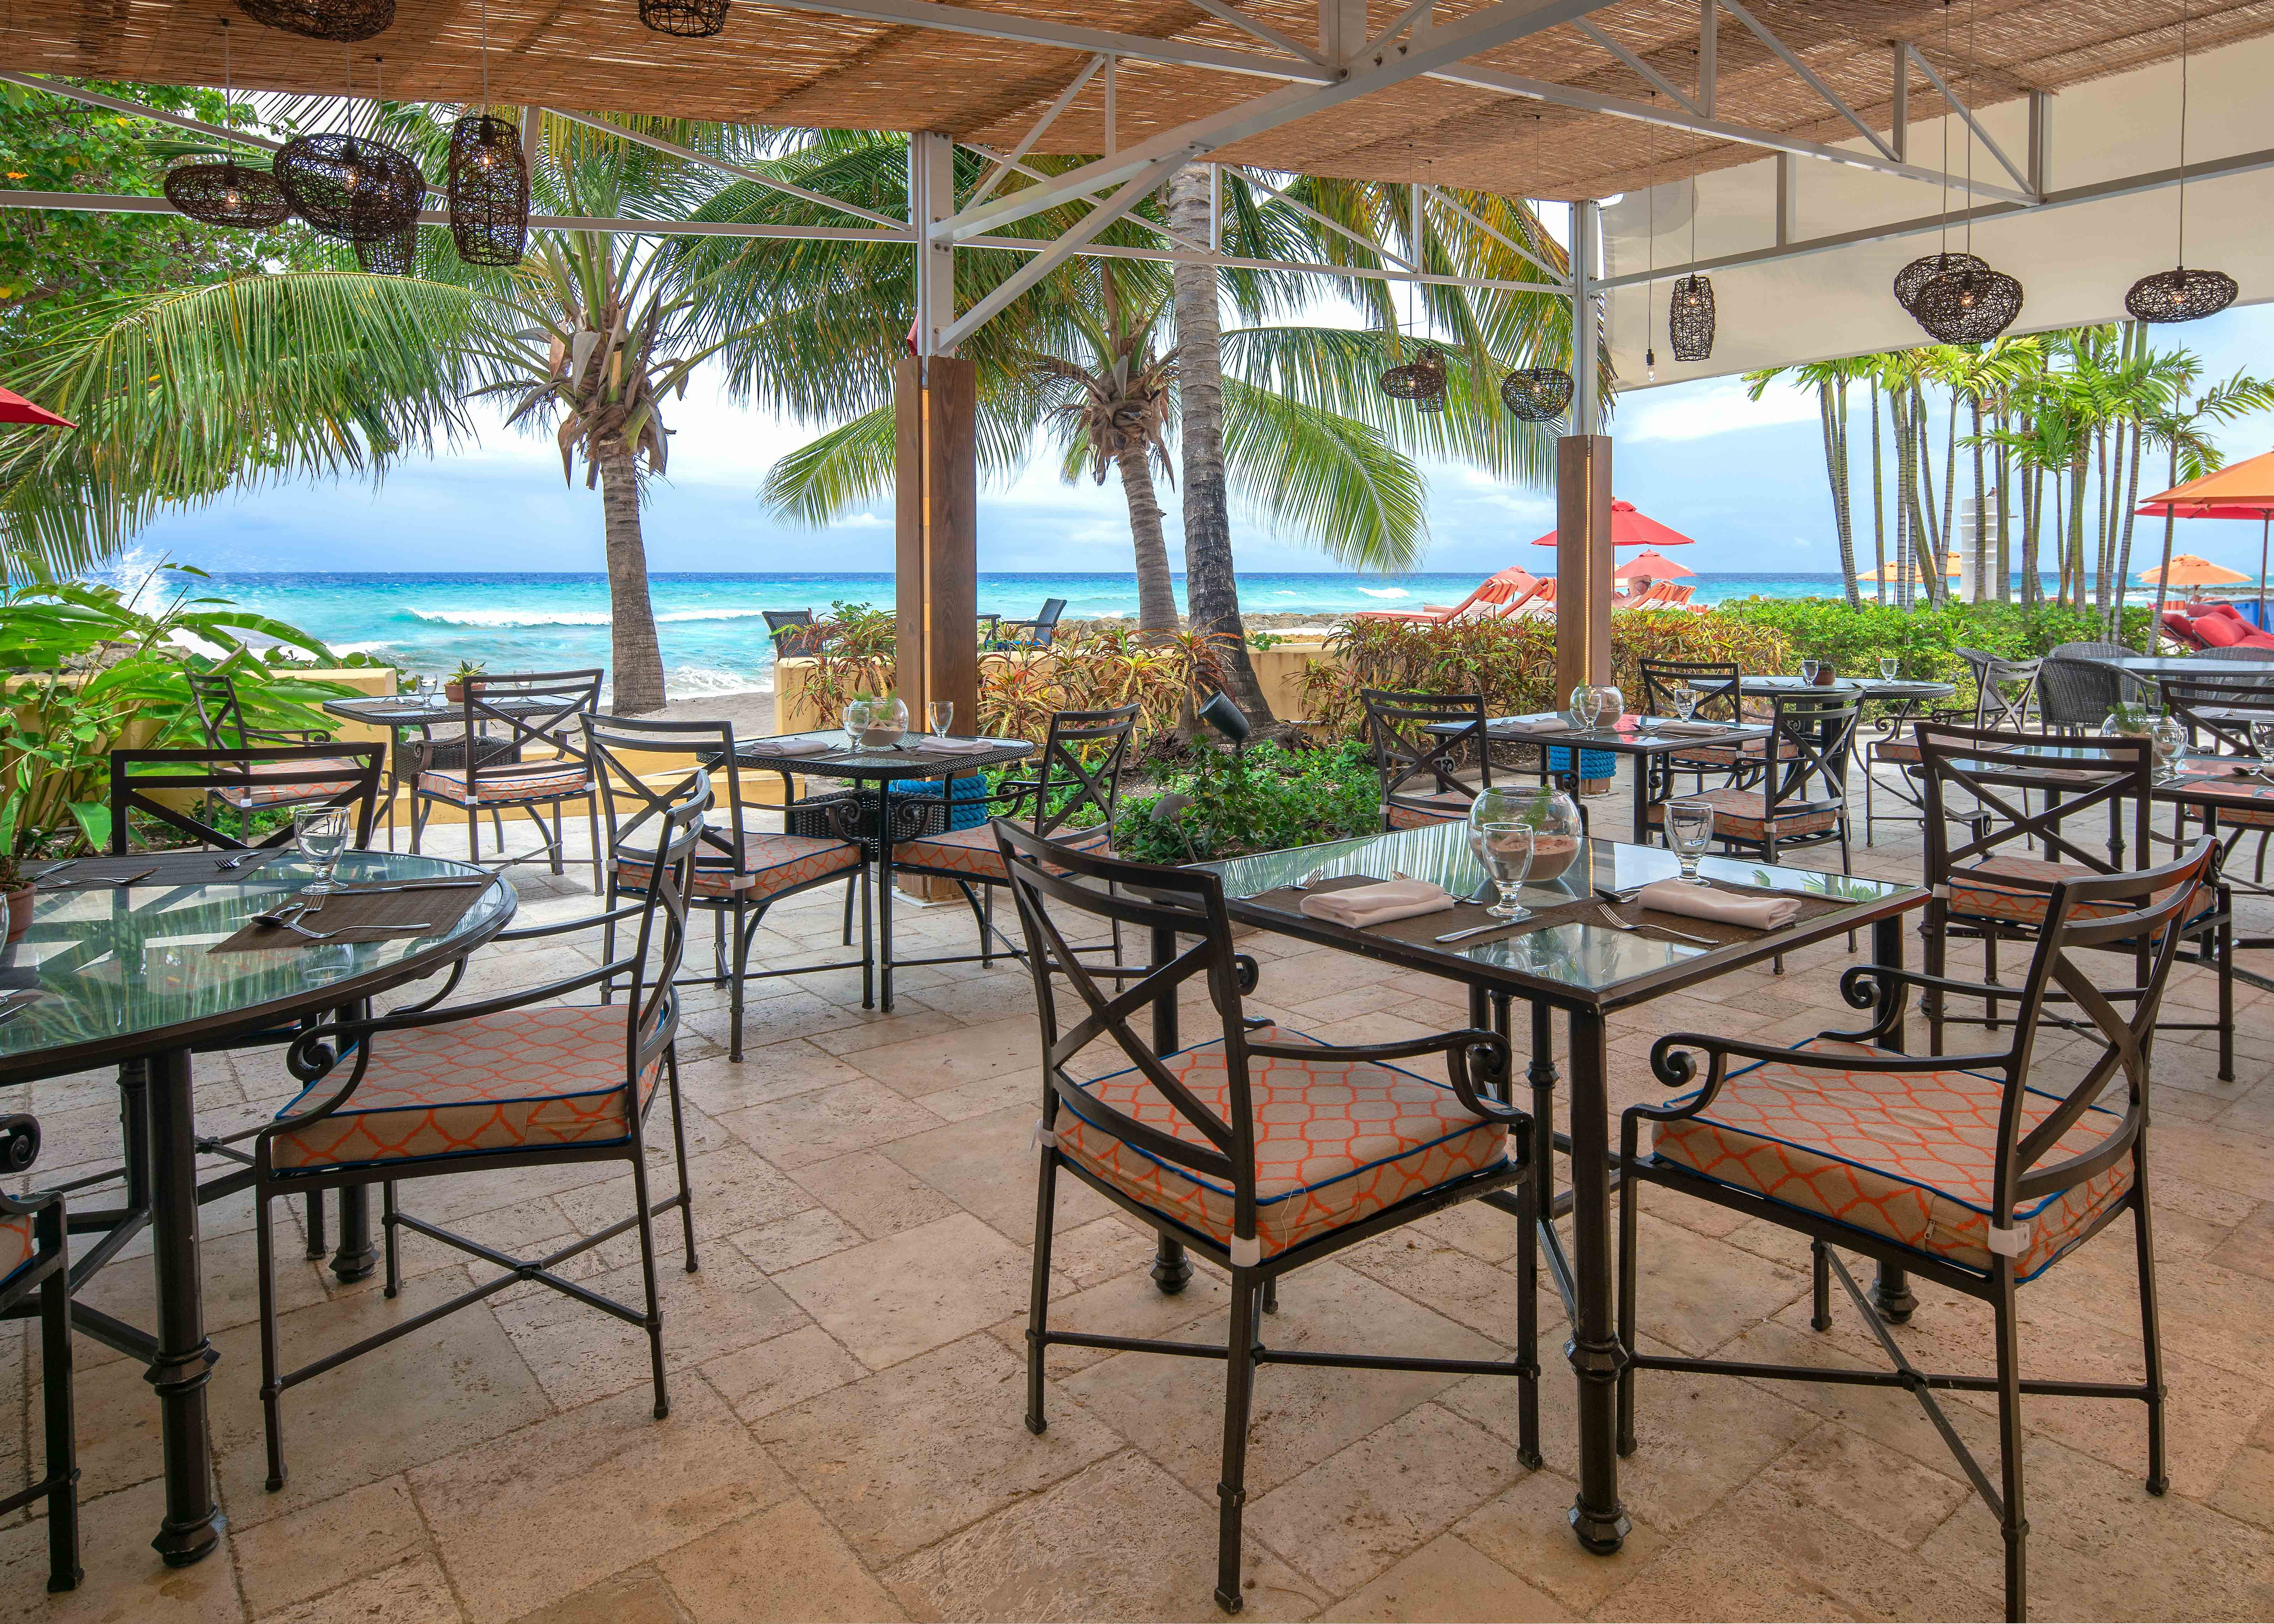 BlueFin Beachfront Grill